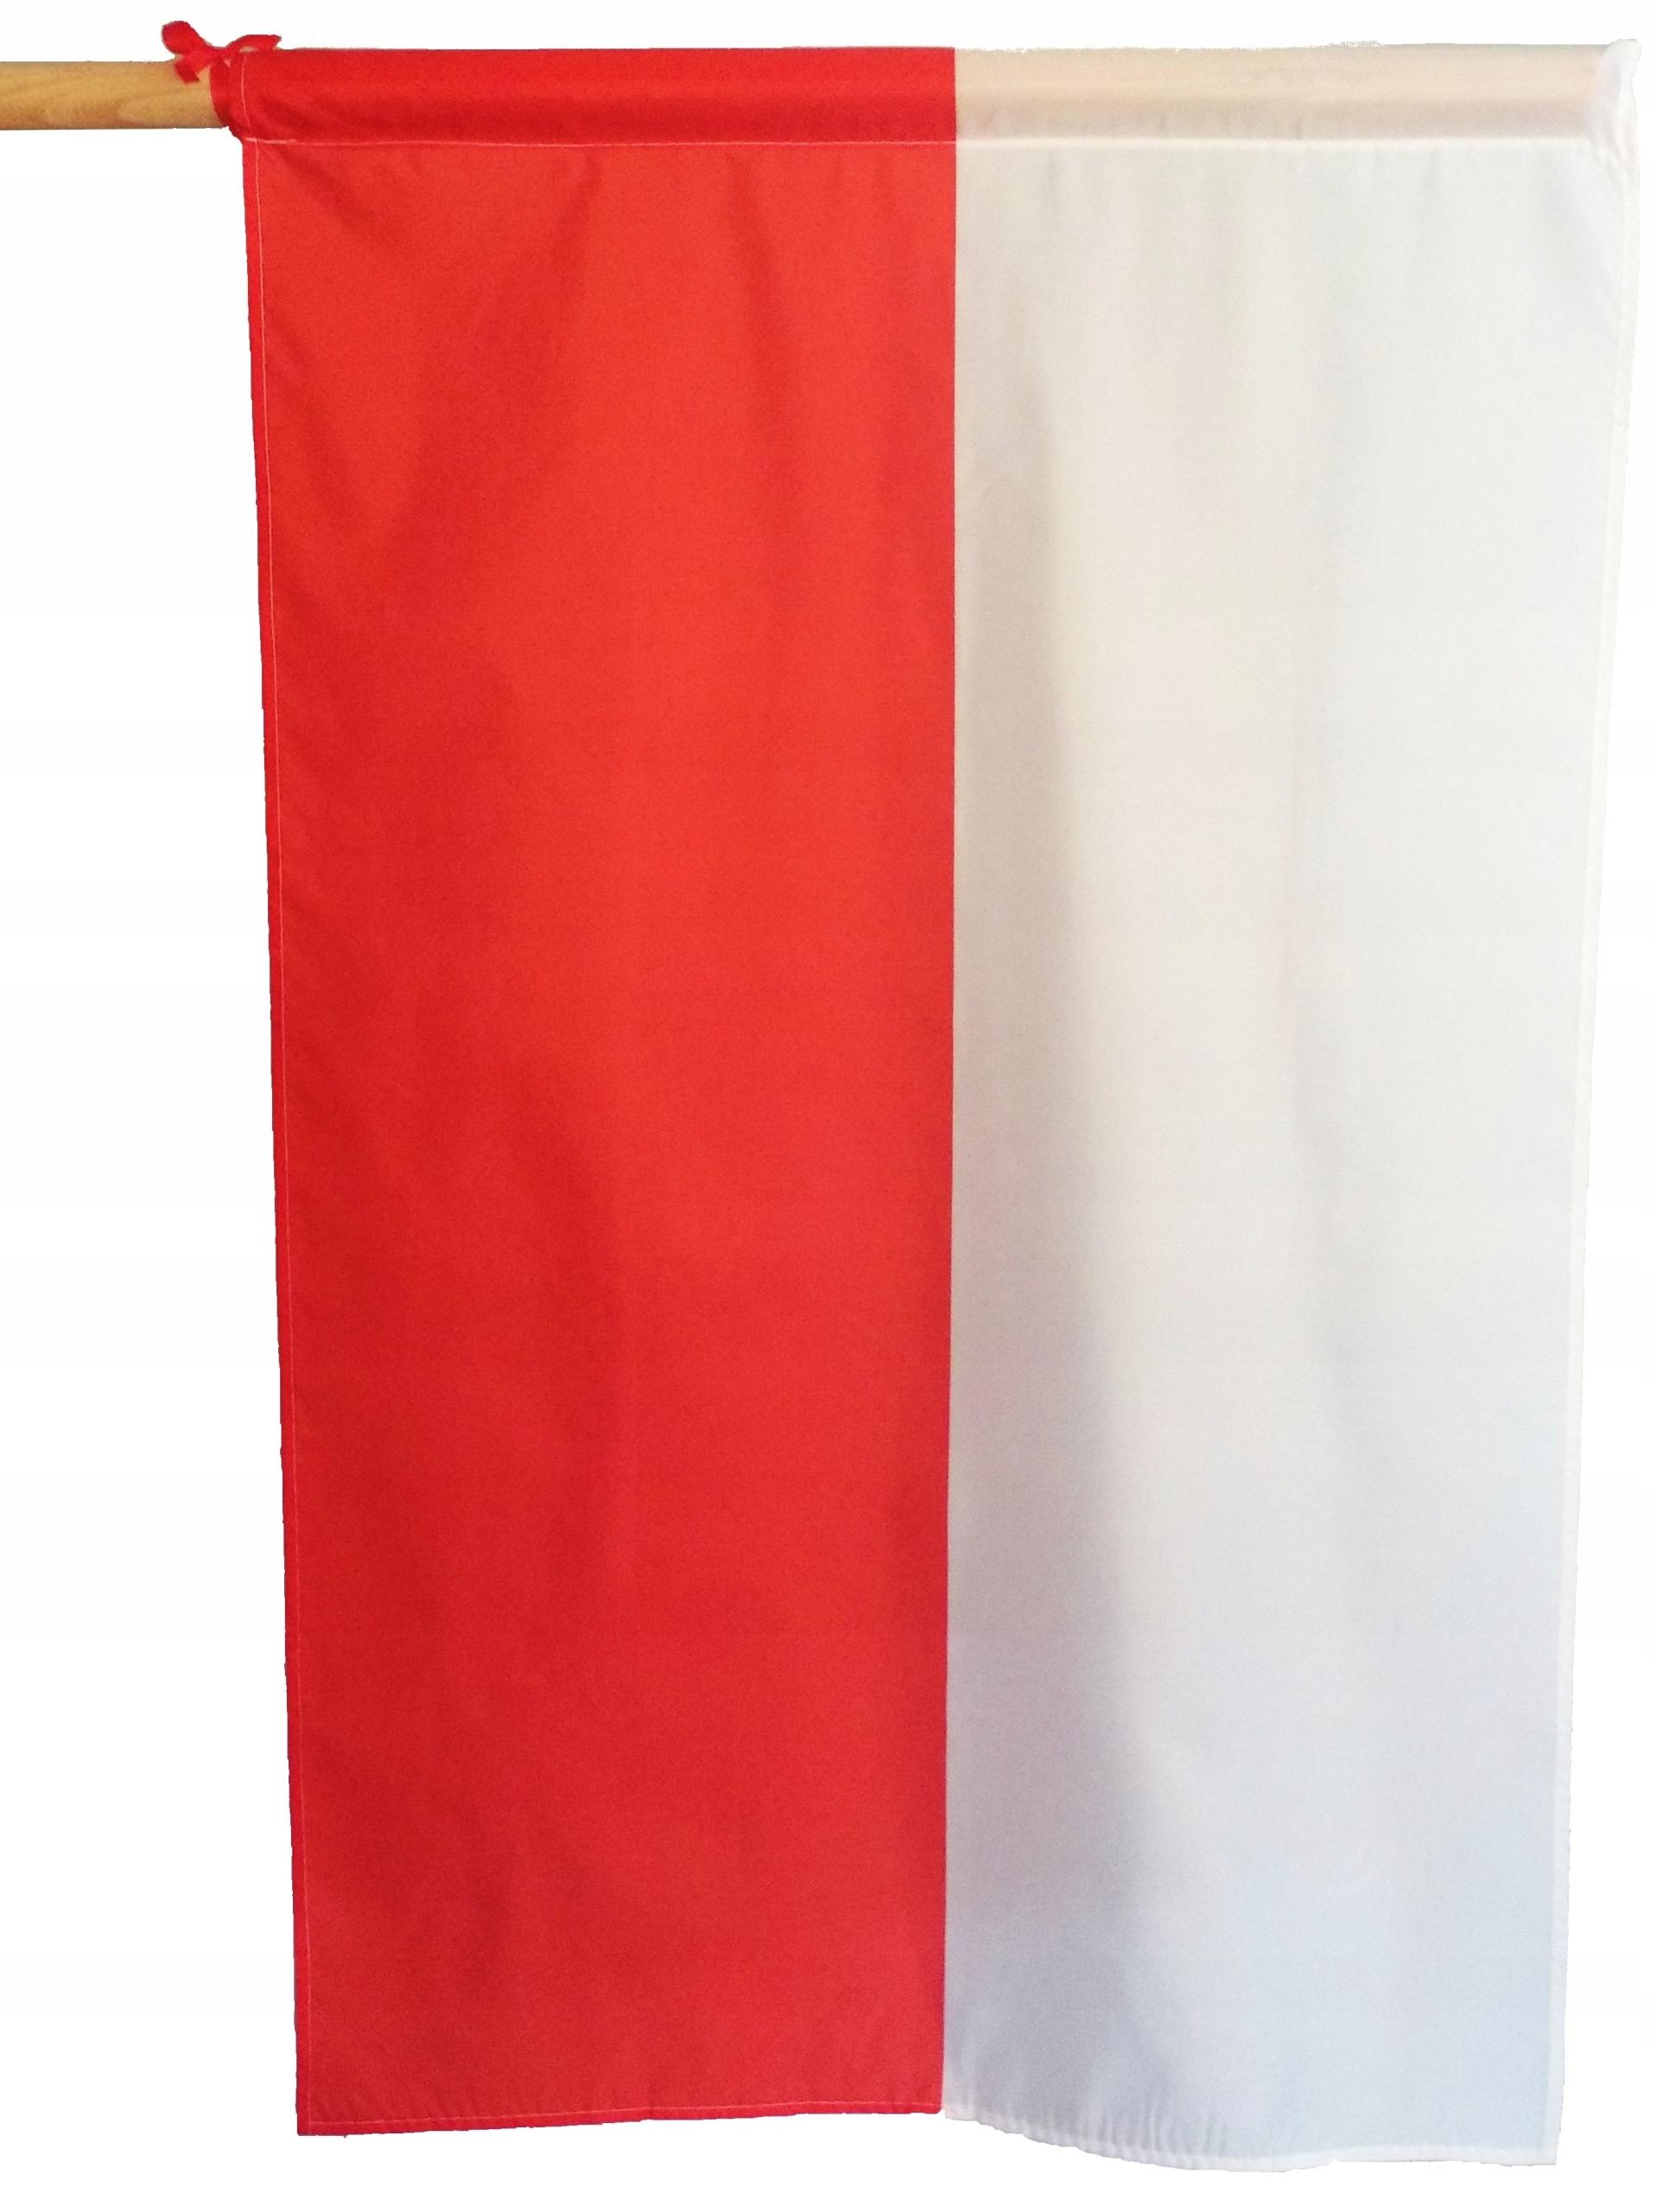 FLAGA POLSKA FLAGI POLSKI TUNEL OBSZYTA 120x75 cm